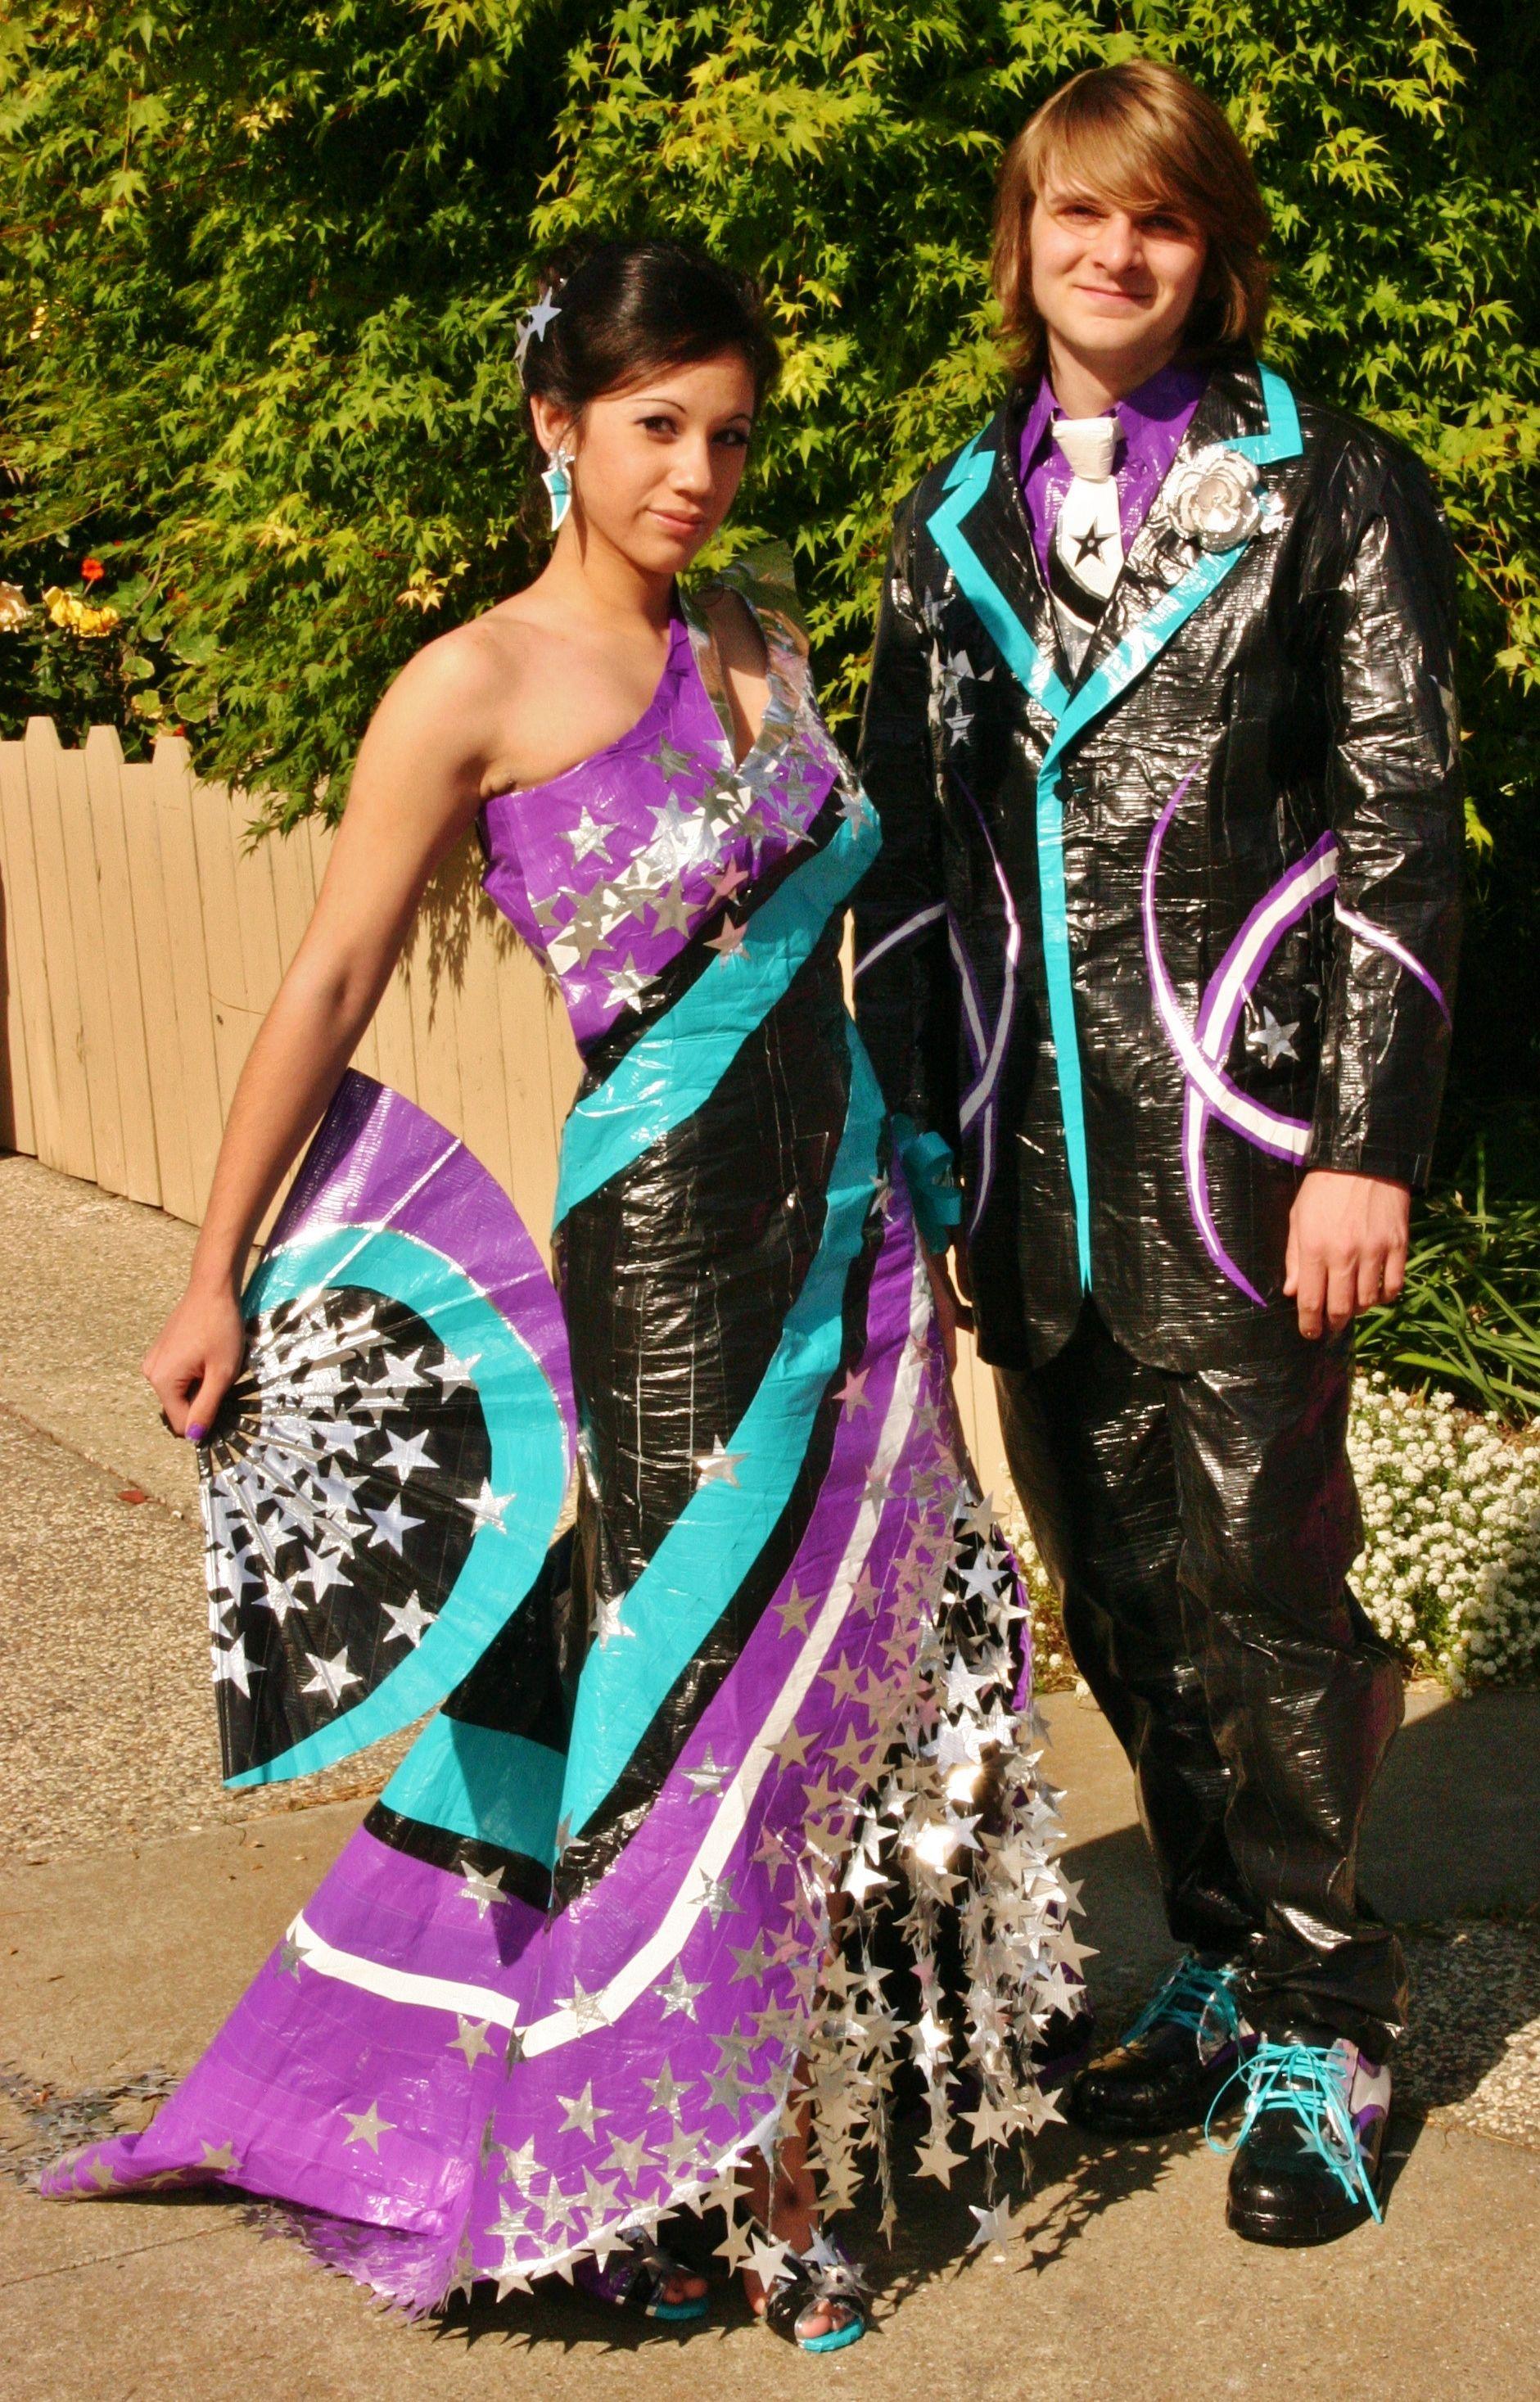 Prom Scholarship Contest finalist. #ducktape #prom @Jennifer Reitzer ...